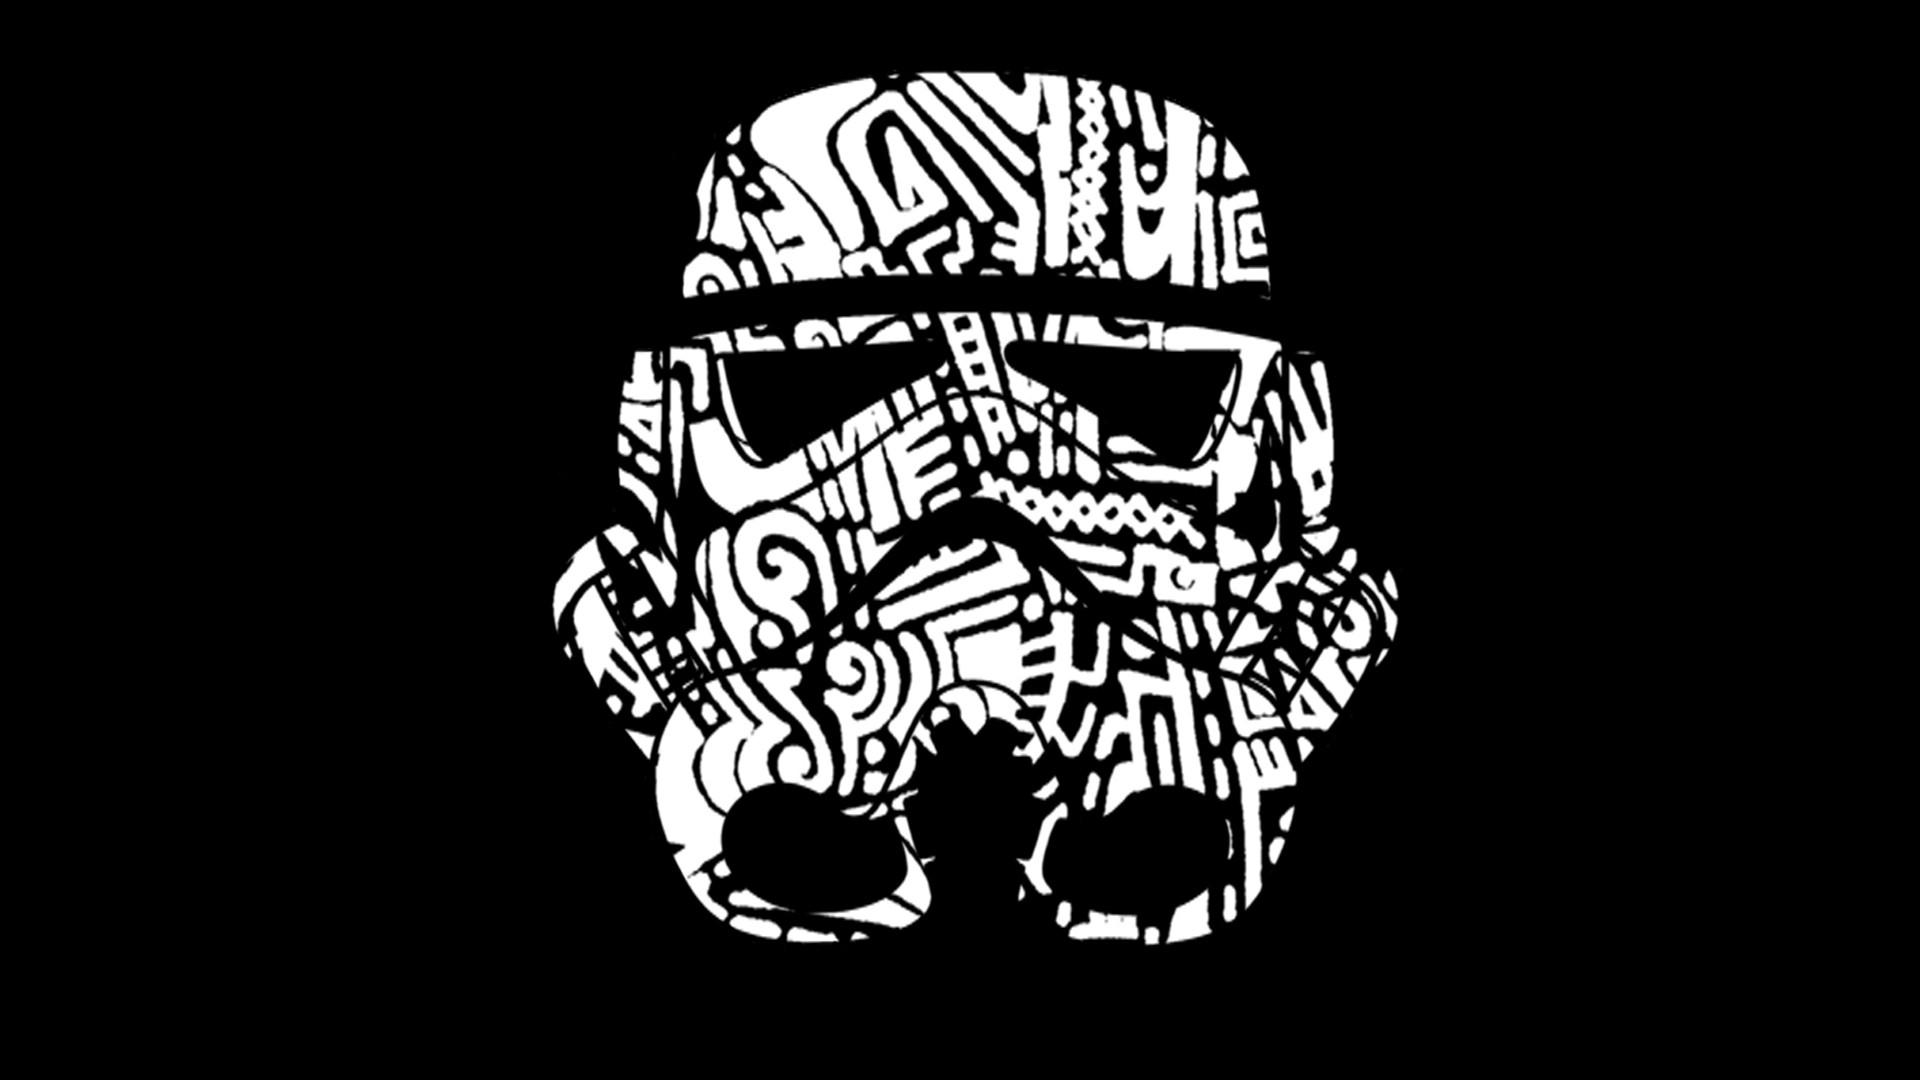 Wallpaper : illustration, Star Wars, text, logo, graphic design, pattern, skull, skeleton, brand, head, ART, symbol, graphics, 1920x1080 px, ...